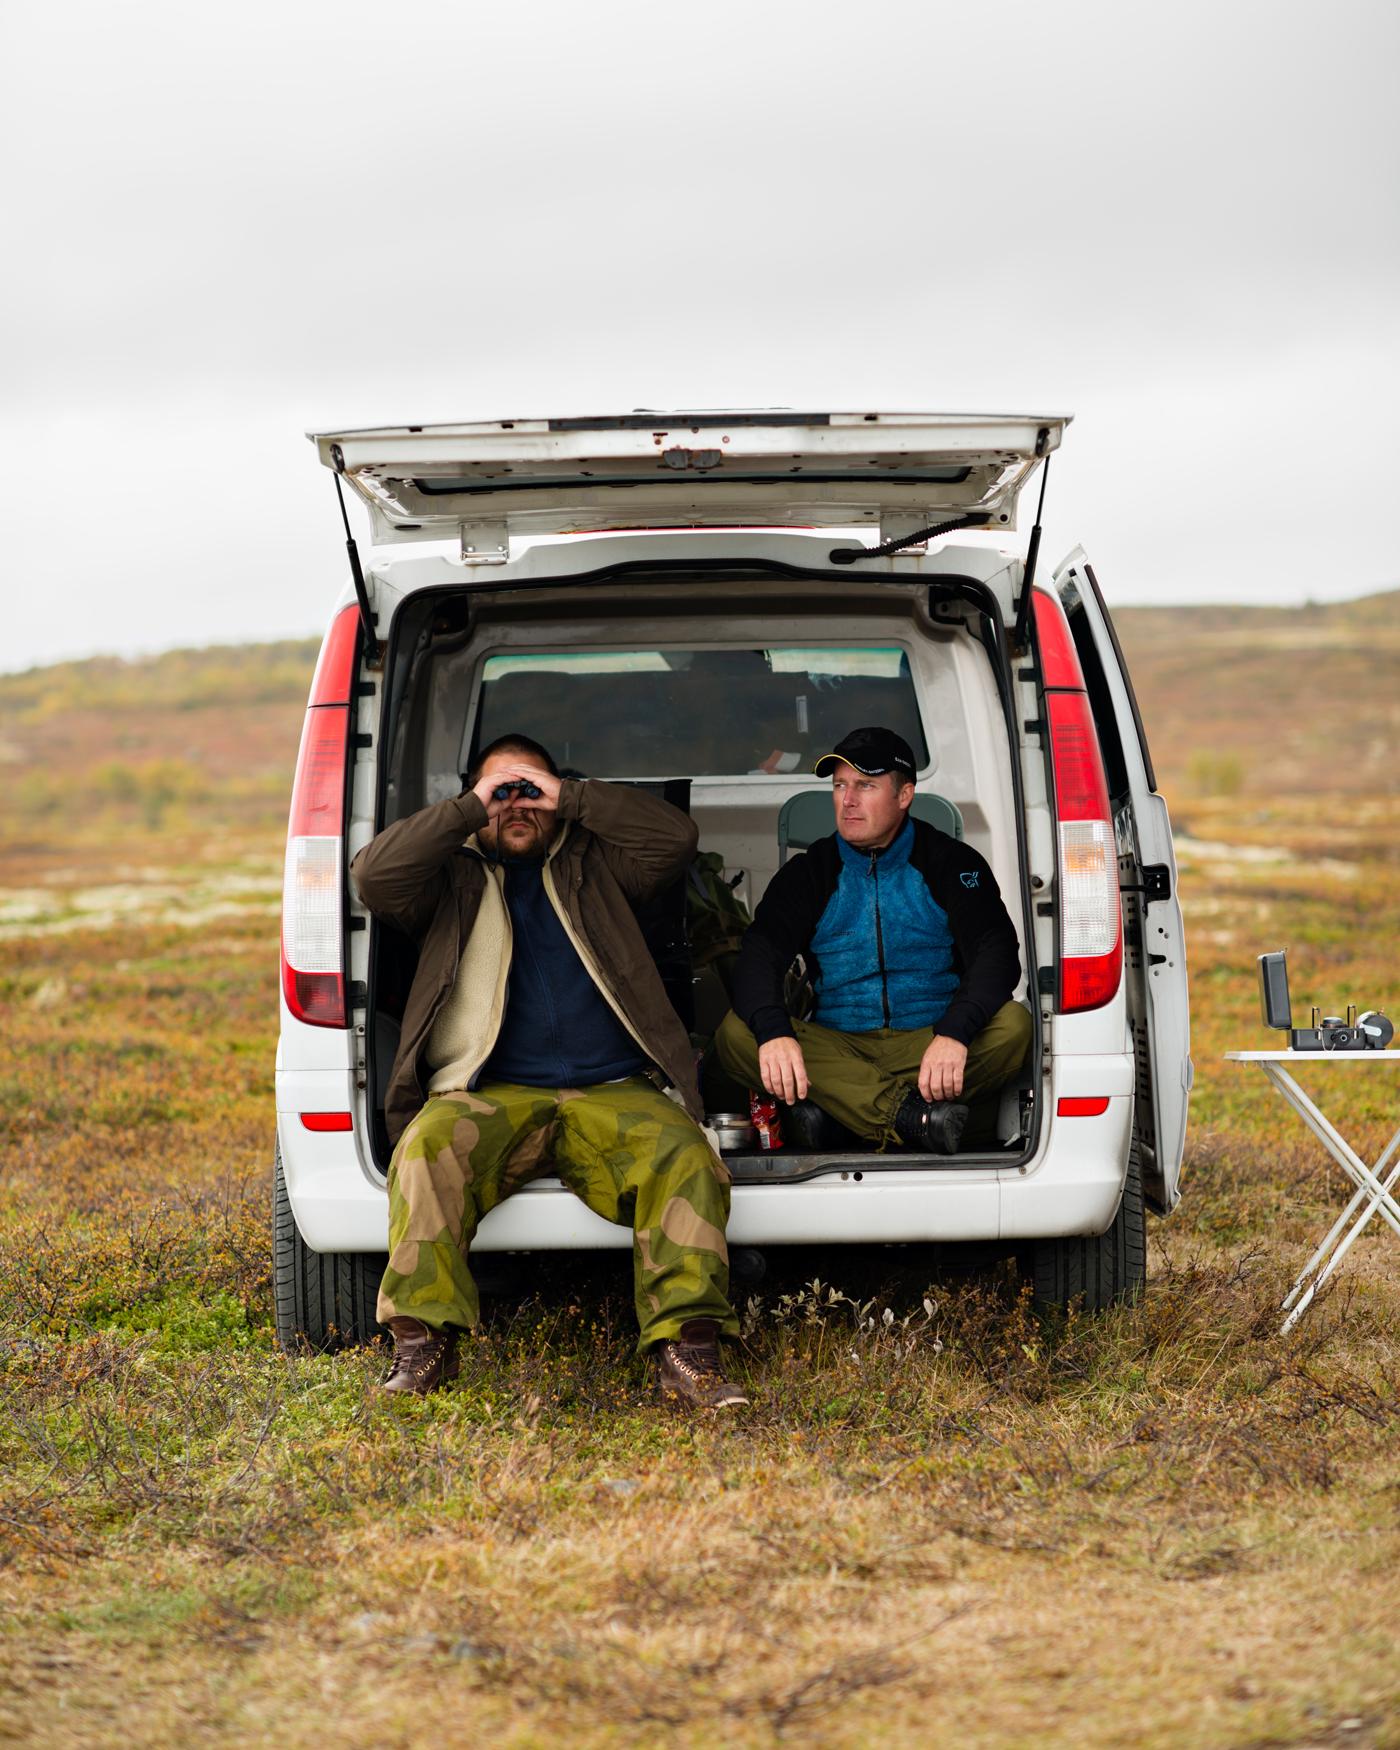 UFO spotters Erik Tobias Øhrn-Andresen and Ole Vidar Nilsen.